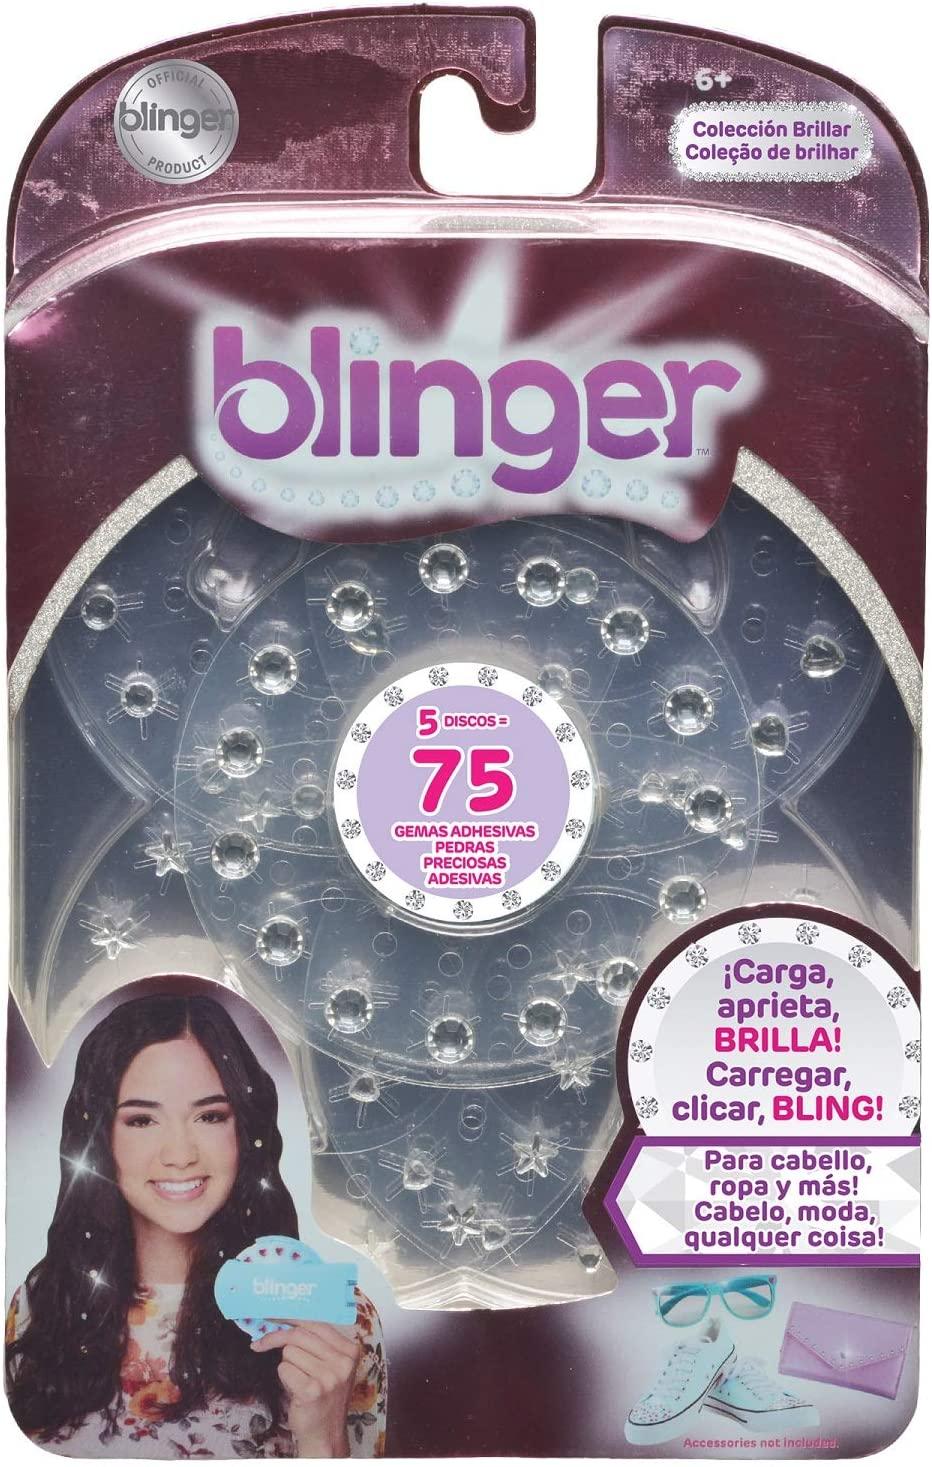 Blinger – Artistic Games Apply Spares Brillinace Pack, Multicolour (Bizak 63228504_1)